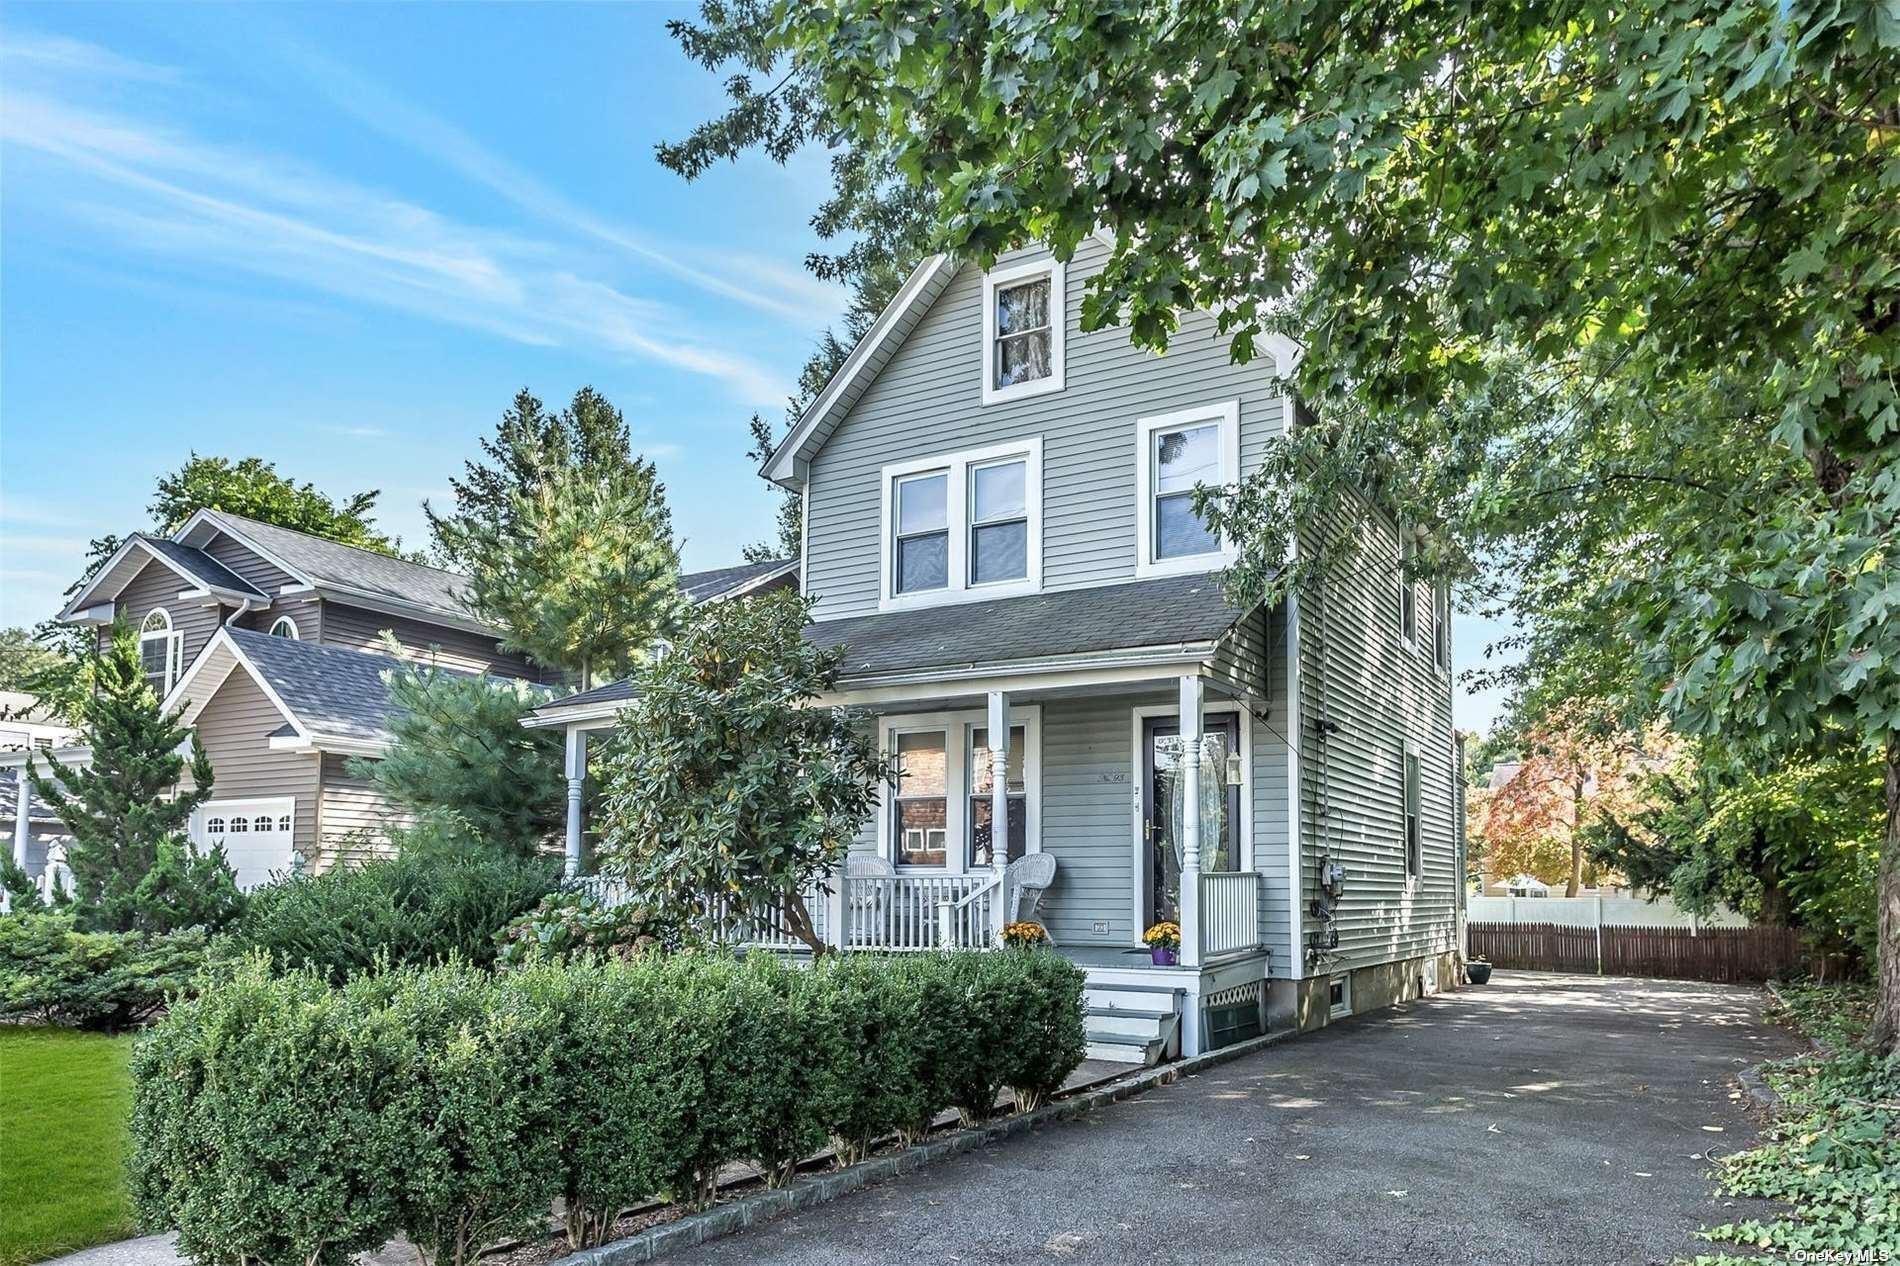 Photo of 93 Walnut Avenue, East Norwich, NY 11732 (MLS # 3353037)